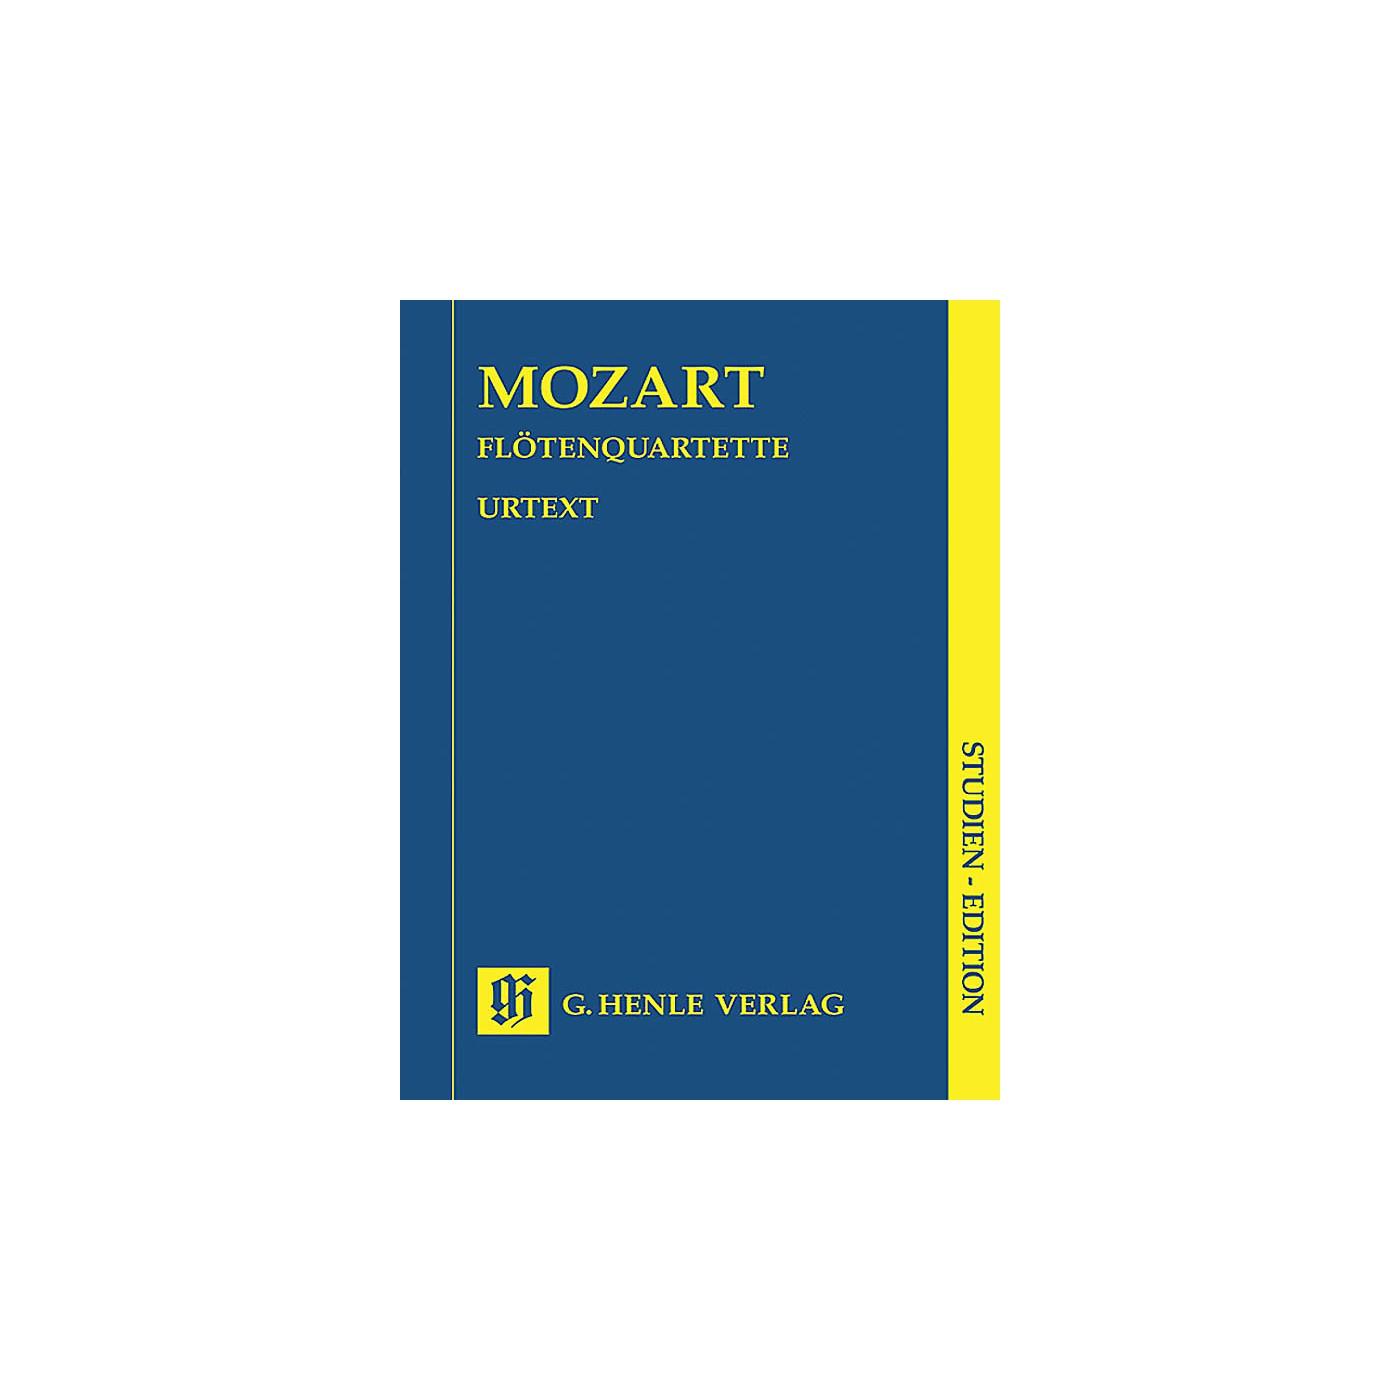 G. Henle Verlag Quartets for Flute, Violin, Viola, and Violoncello Henle Study Scores by Wolfgang Amadeus Mozart thumbnail